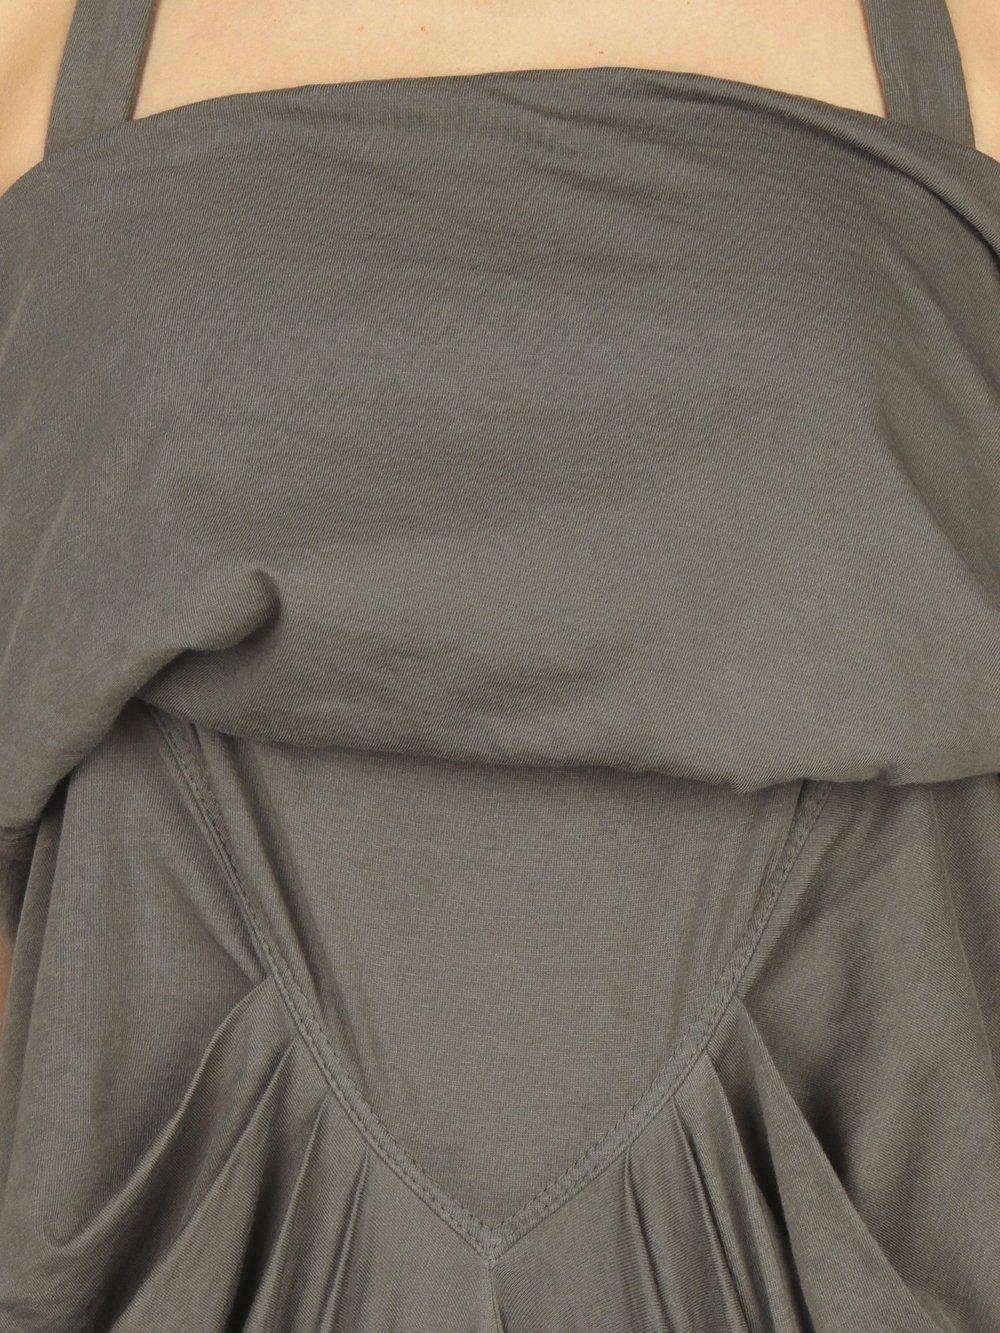 RICK OWENS DRKSHDW - BUSTIER DRESS